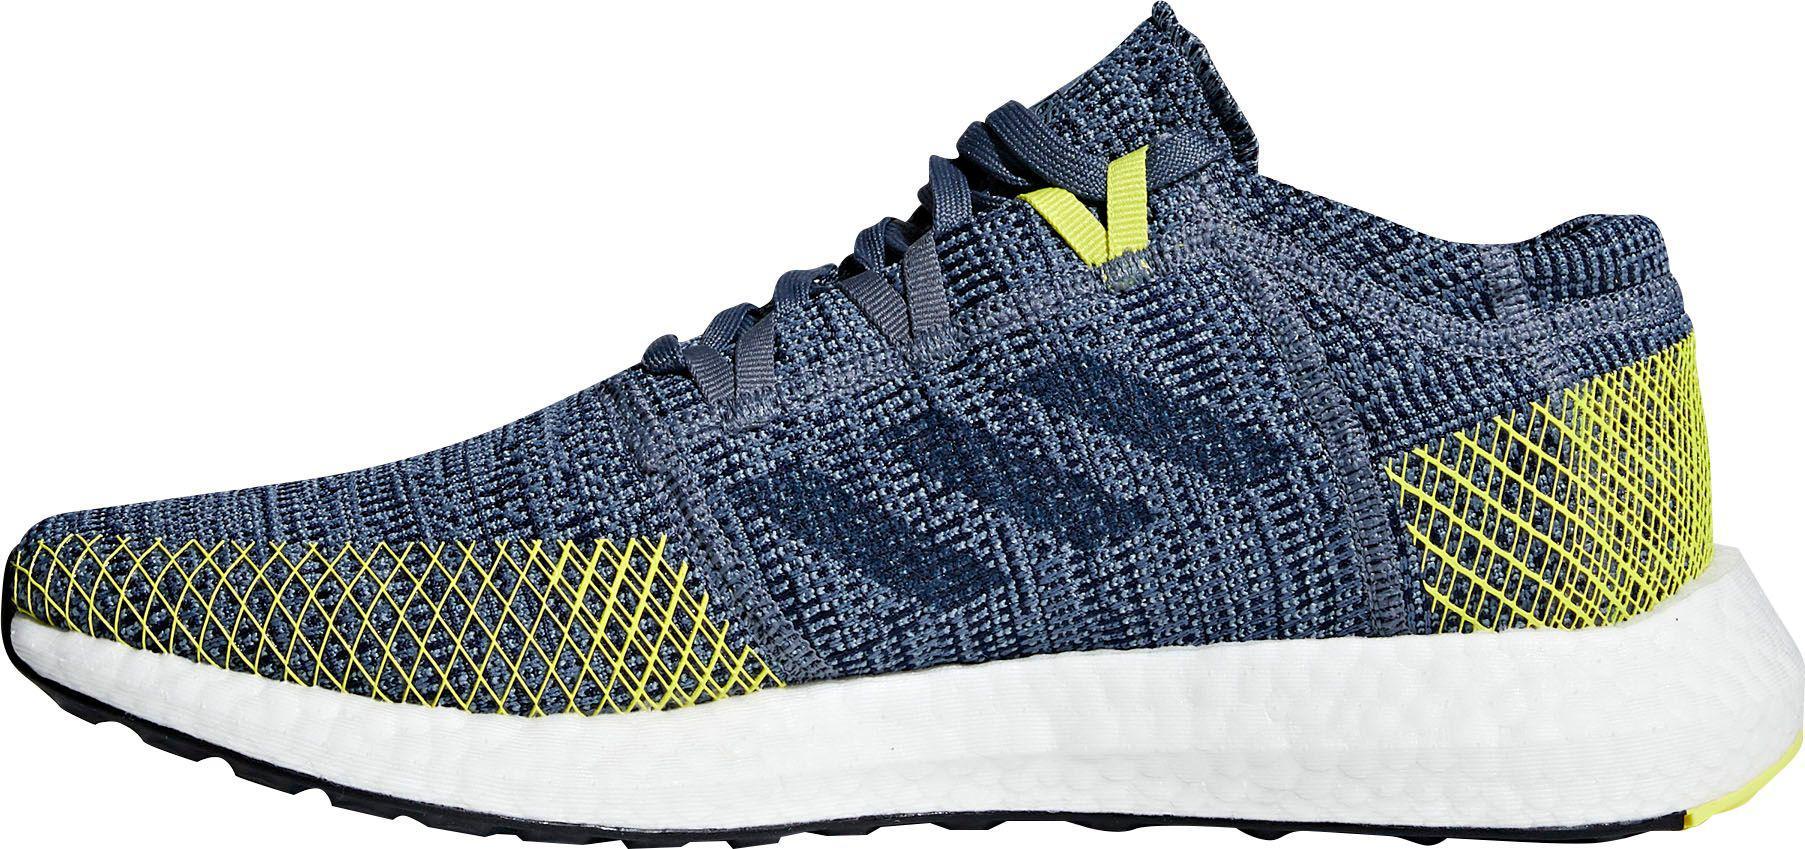 ae948dd9e Lyst - adidas Pureboost Go Running Shoes in Blue for Men